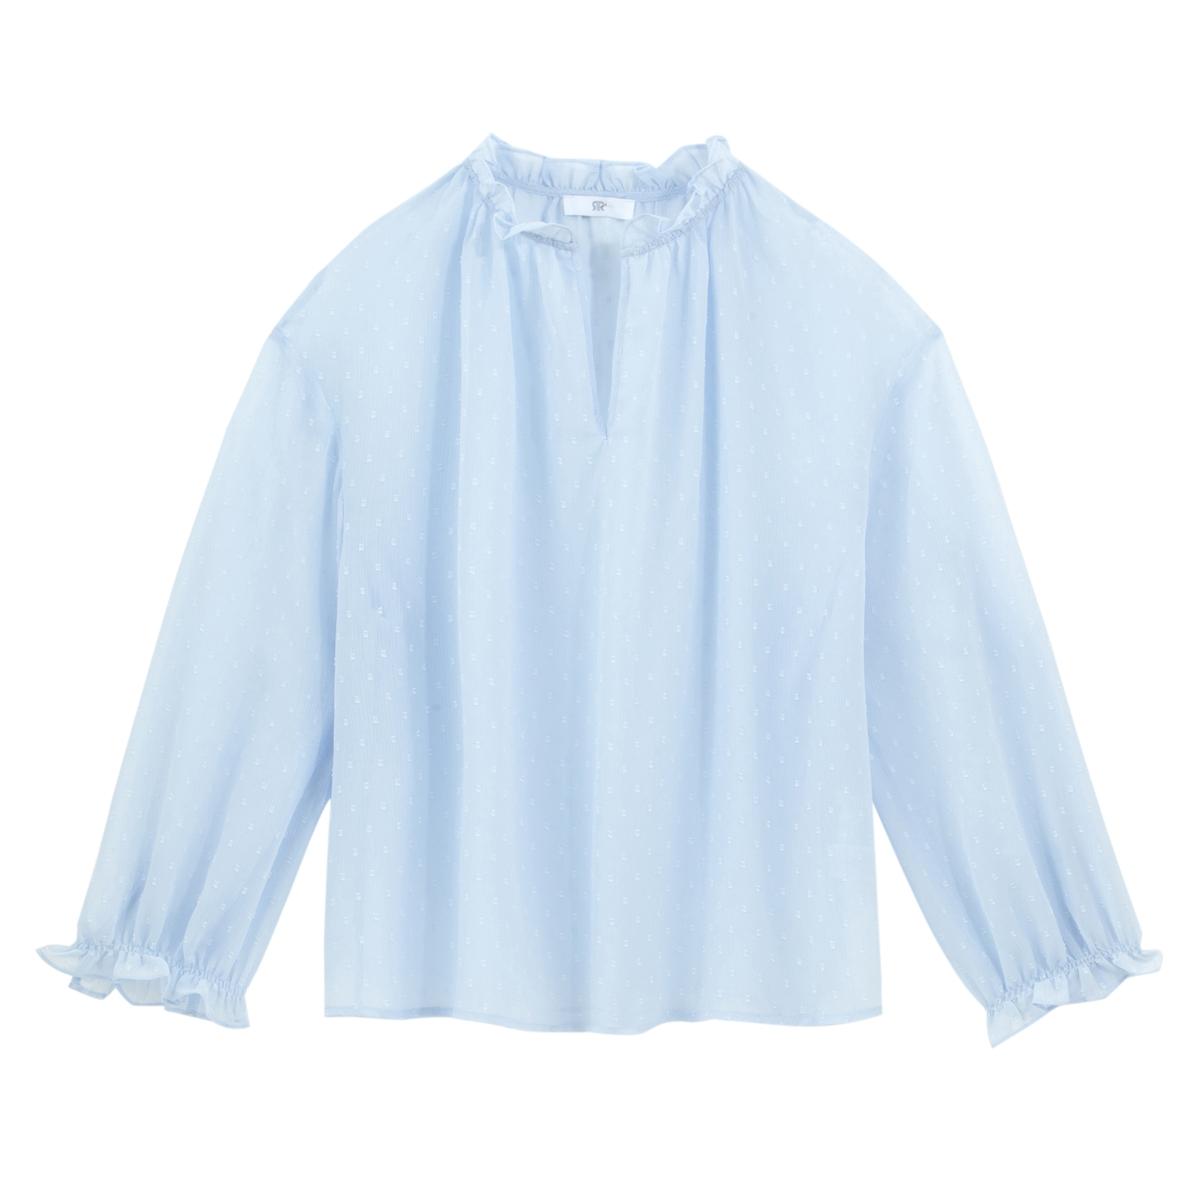 Blusa de plumetis con cuello alto, de manga larga